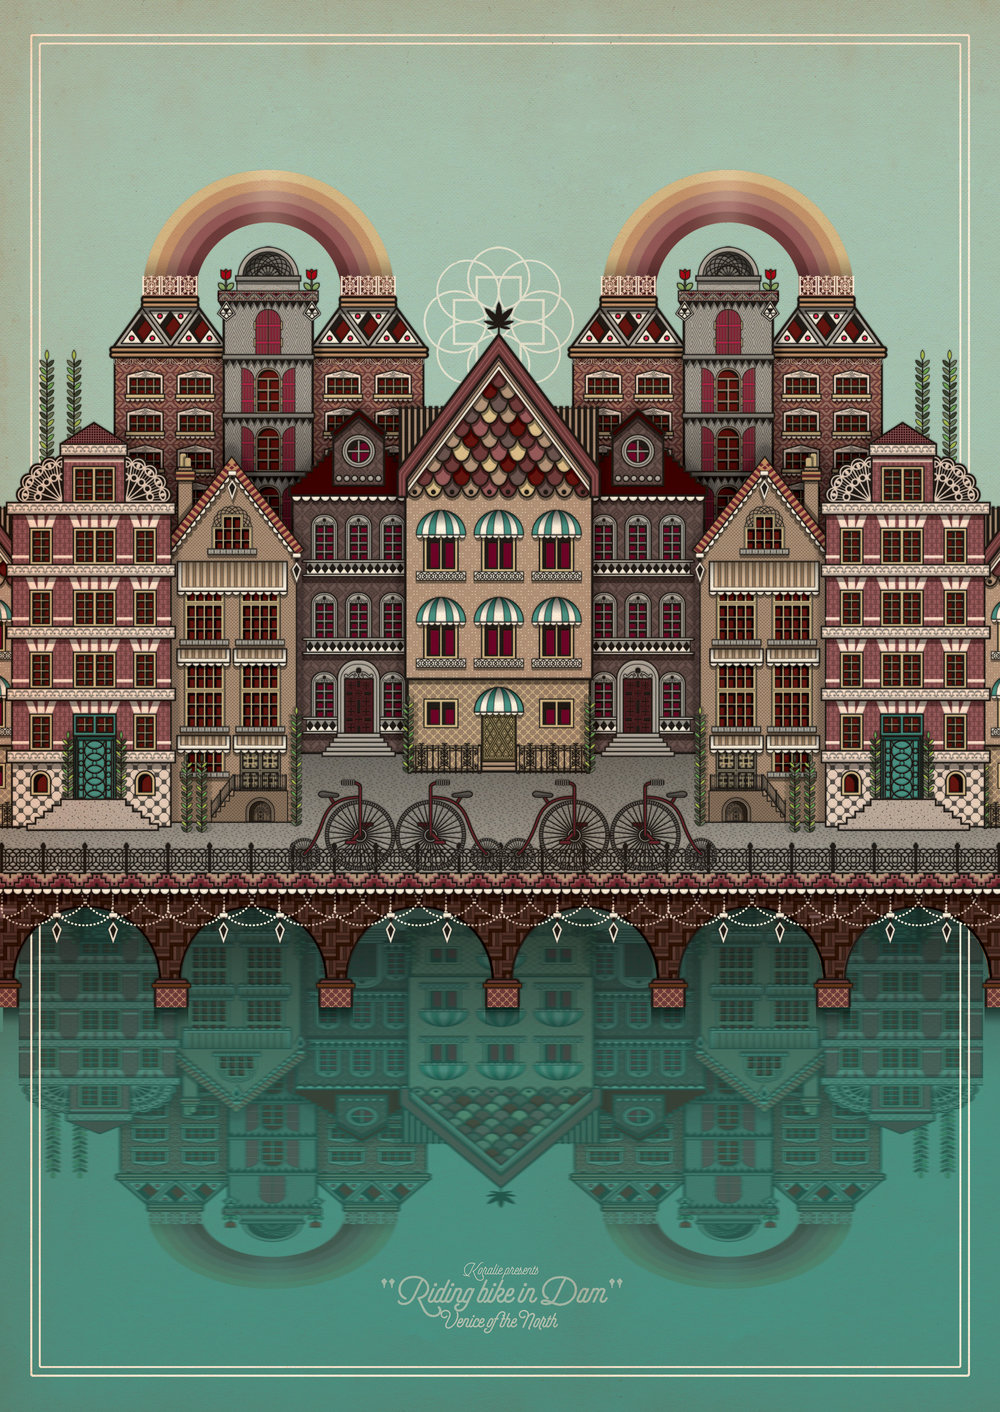 Dam  - Digital illustration   2014